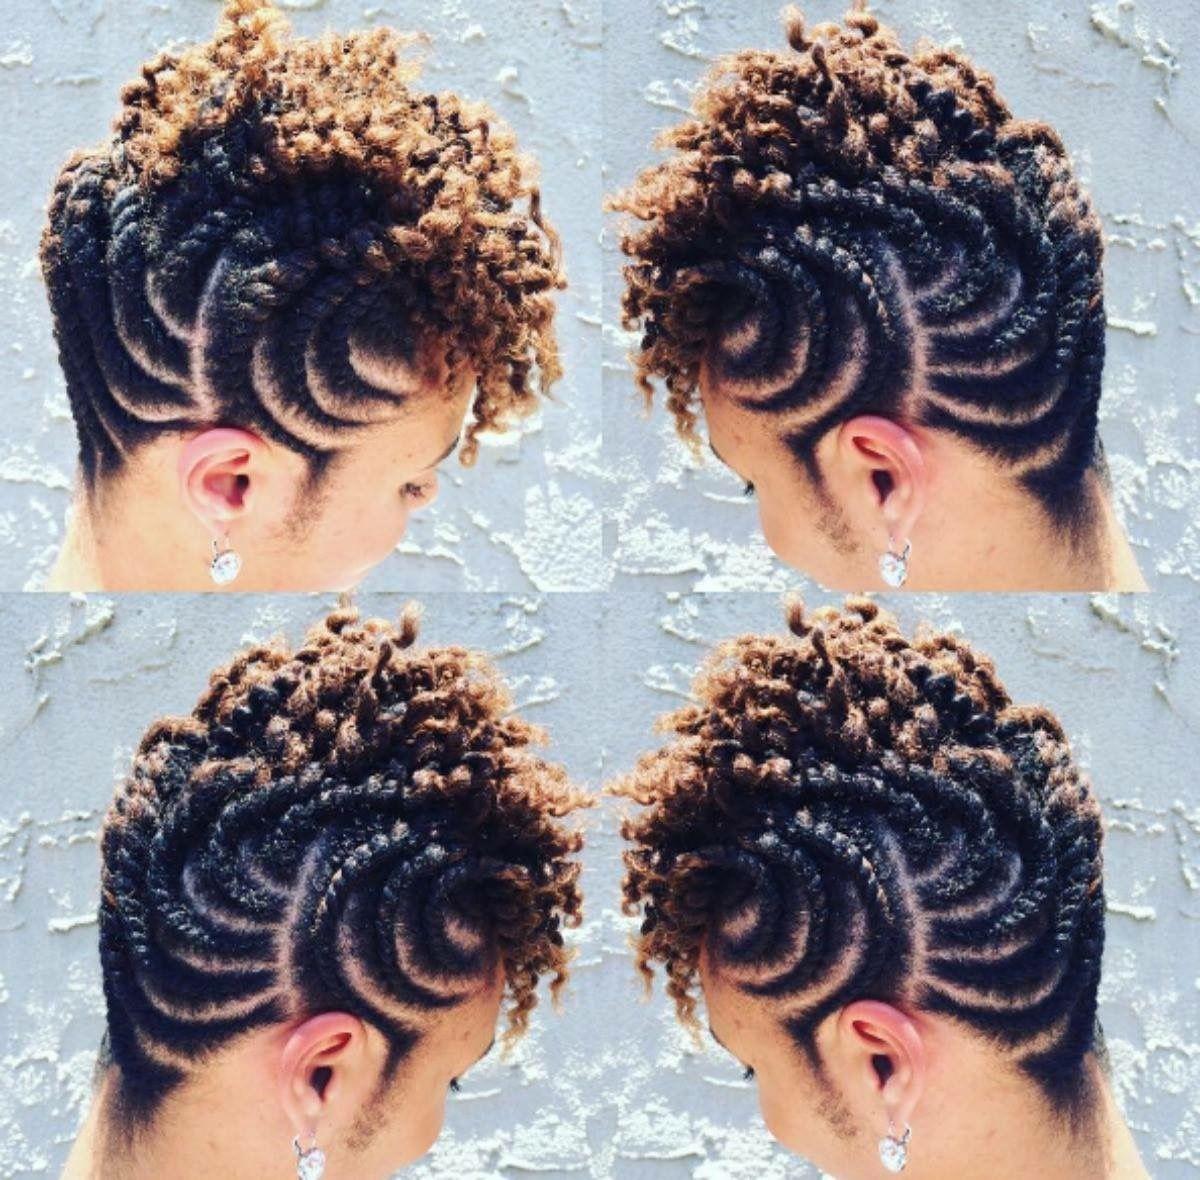 Pin By Mina Diop On Nappturality Natural Hair Updo Natural Hair Twists Short Natural Hair Styles